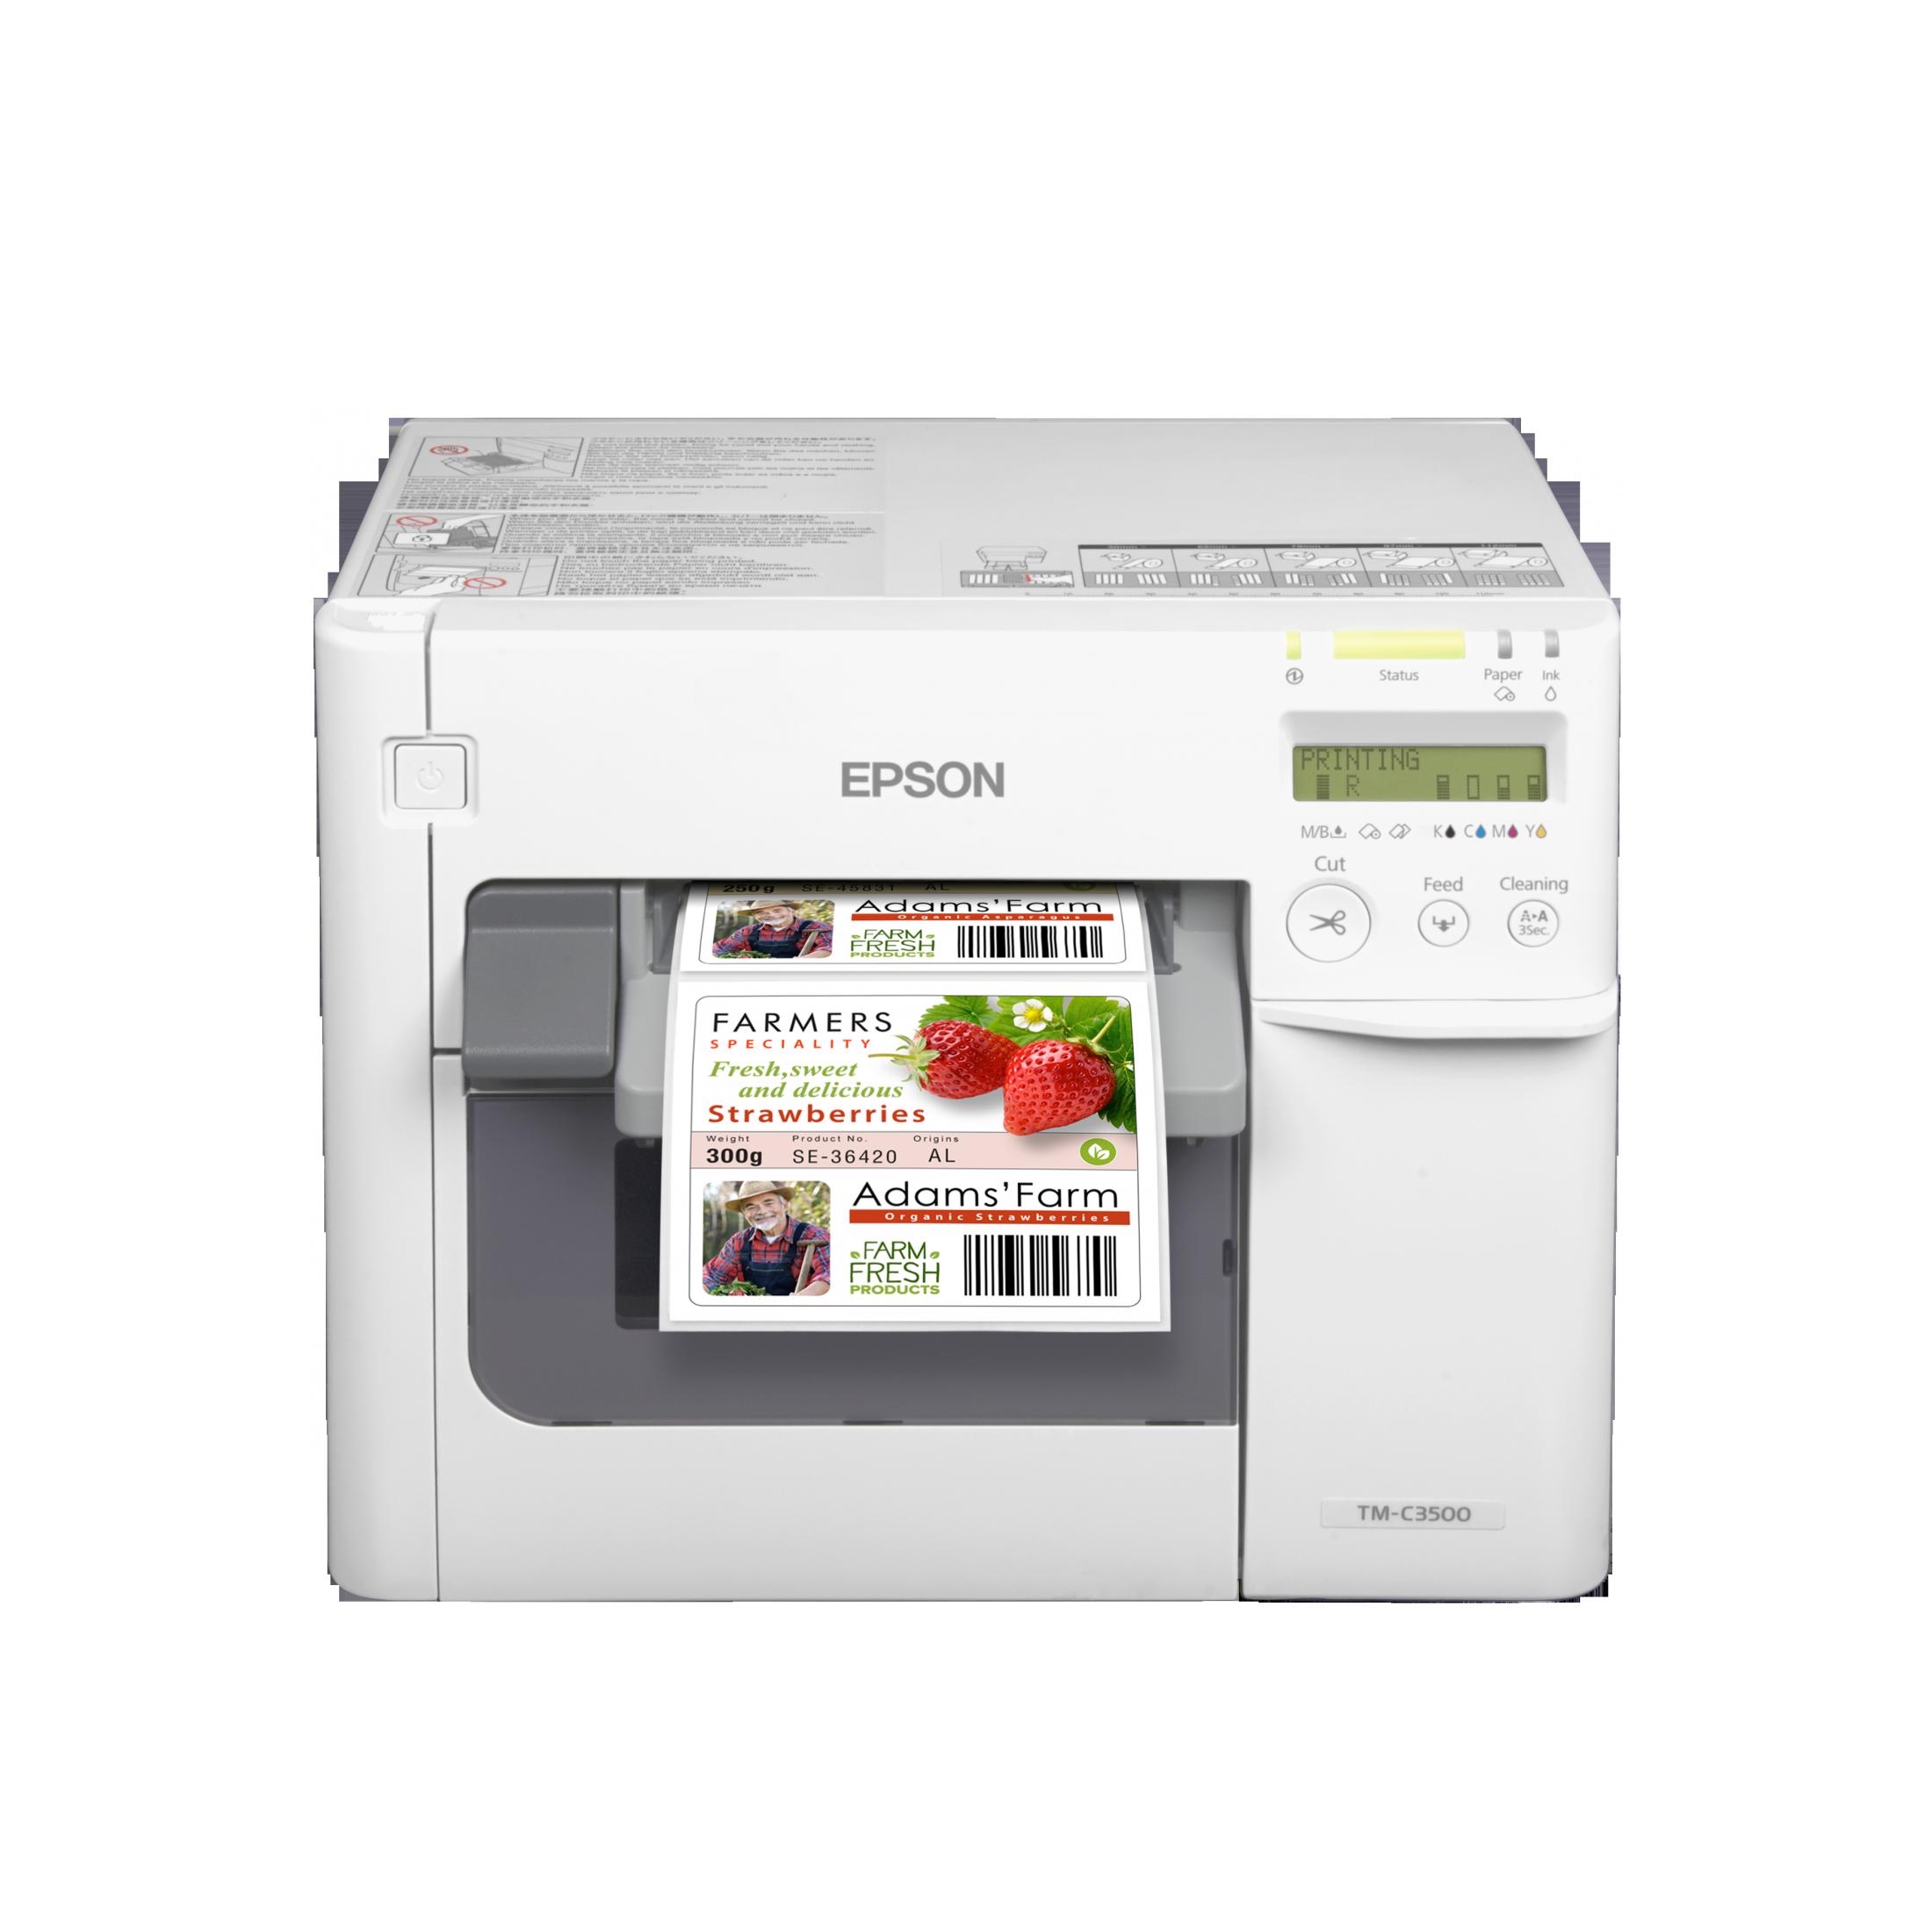 EPSON Label C3510 uPrinterShop.com